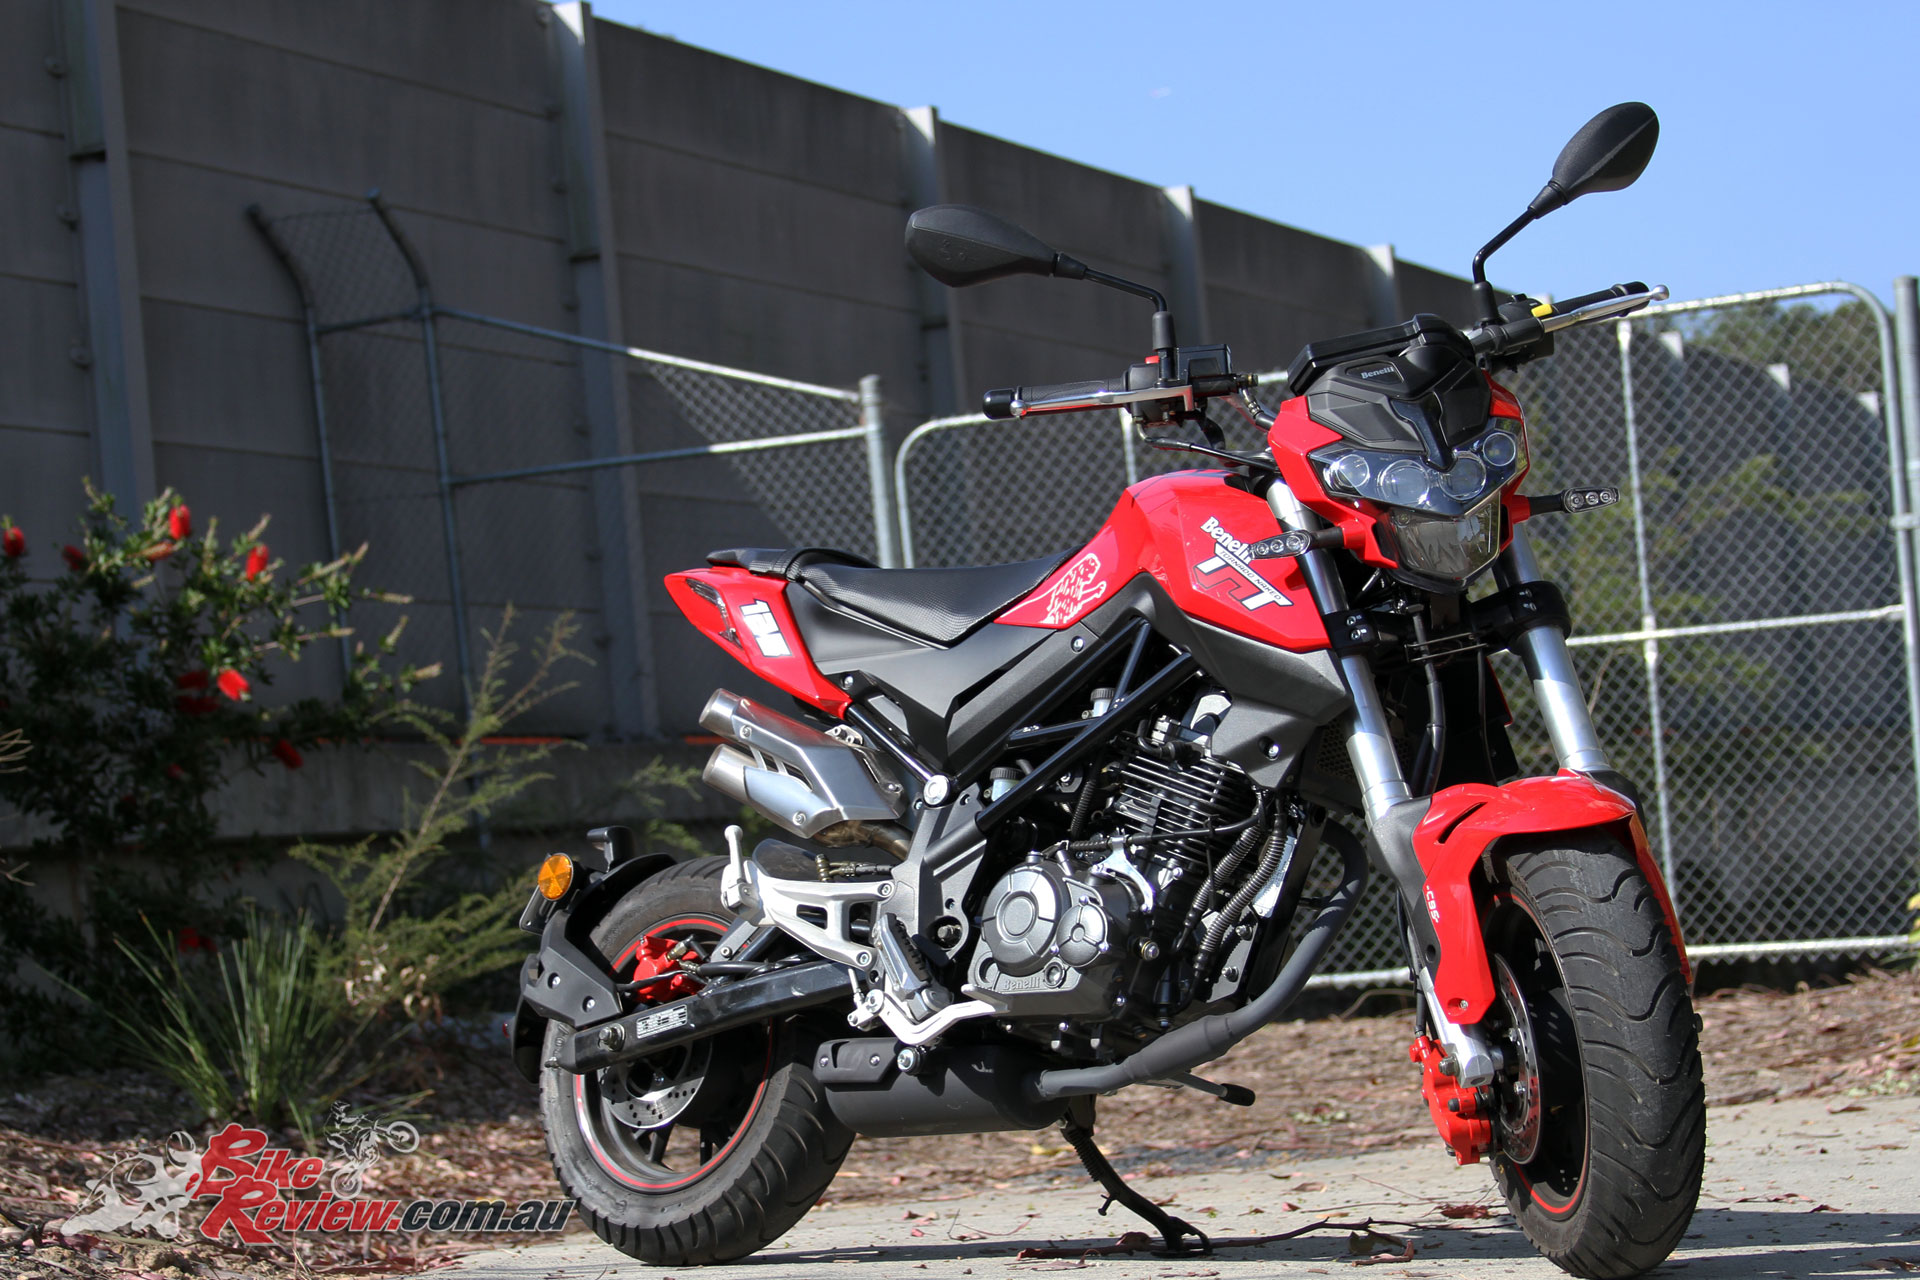 Redline Motorcyles - BENELLI TNT 125